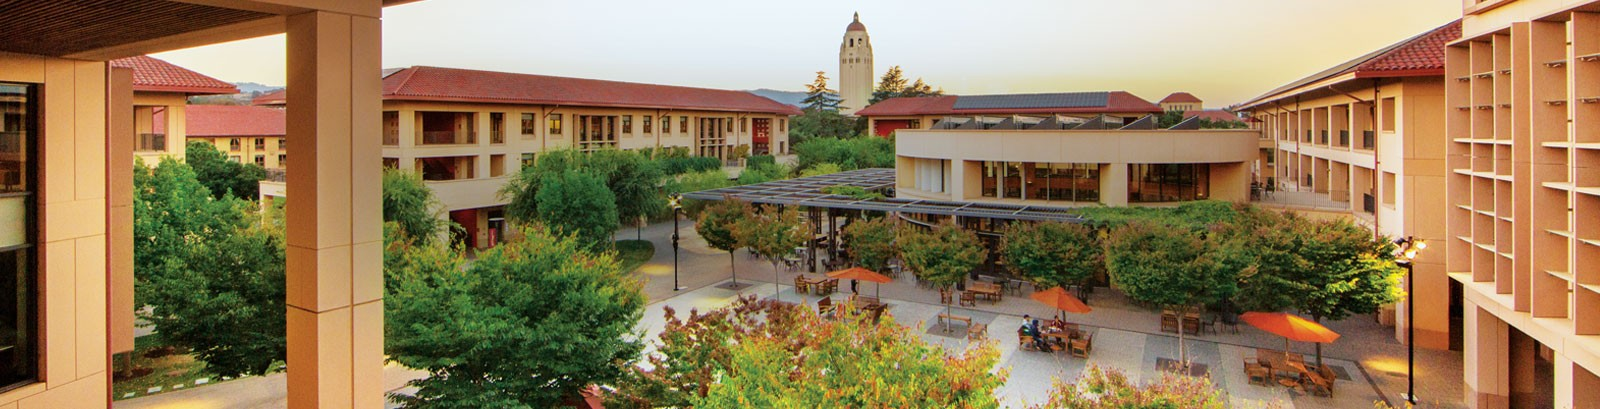 Stanford Management Company   LinkedIn